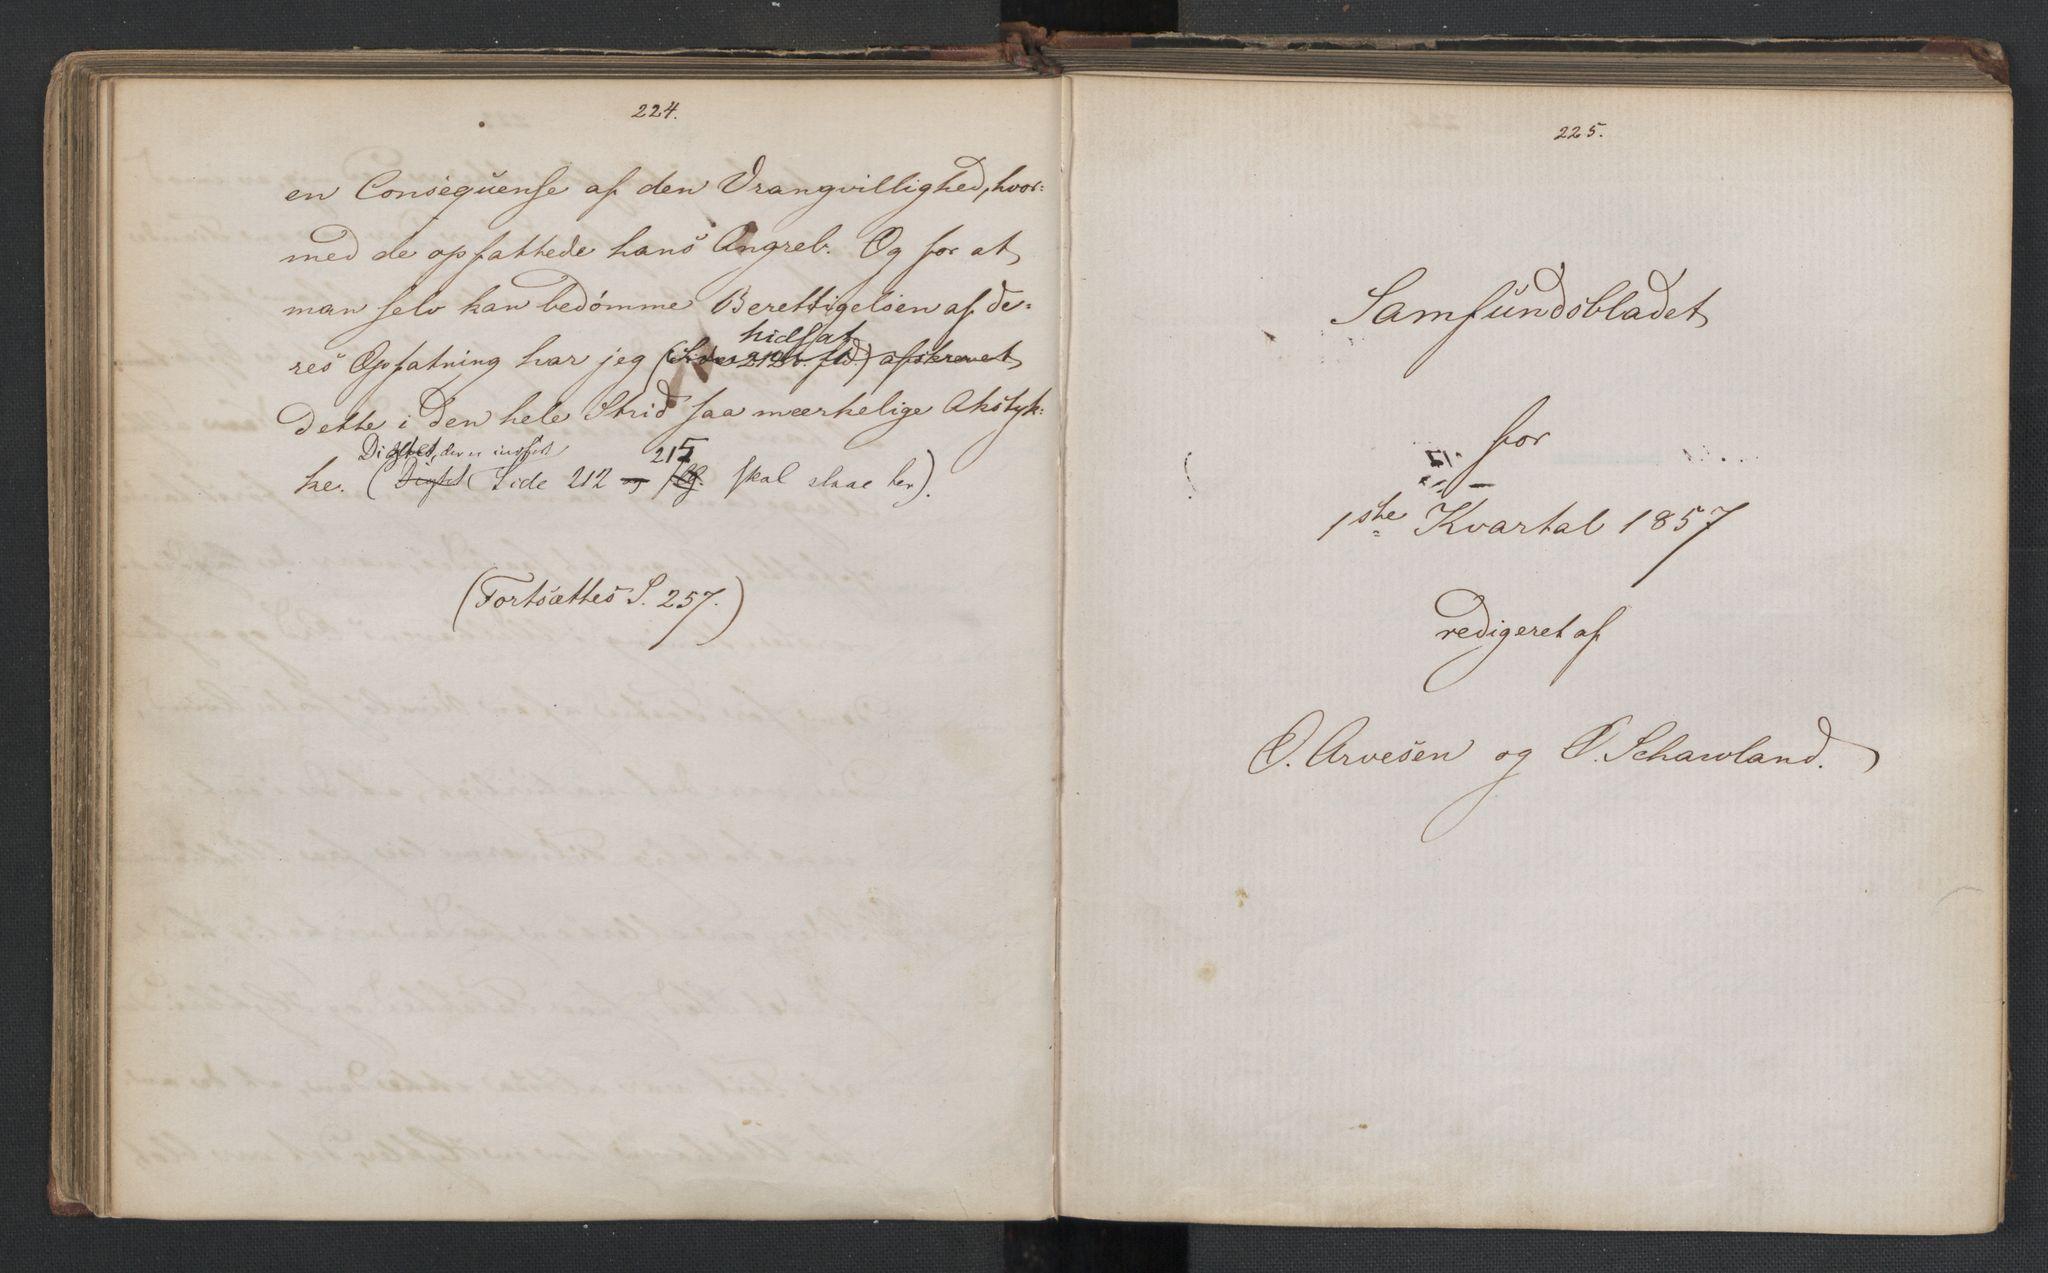 RA, Det Norske Studentersamfund, X/Xa/L0006, 1856-1857, s. 116